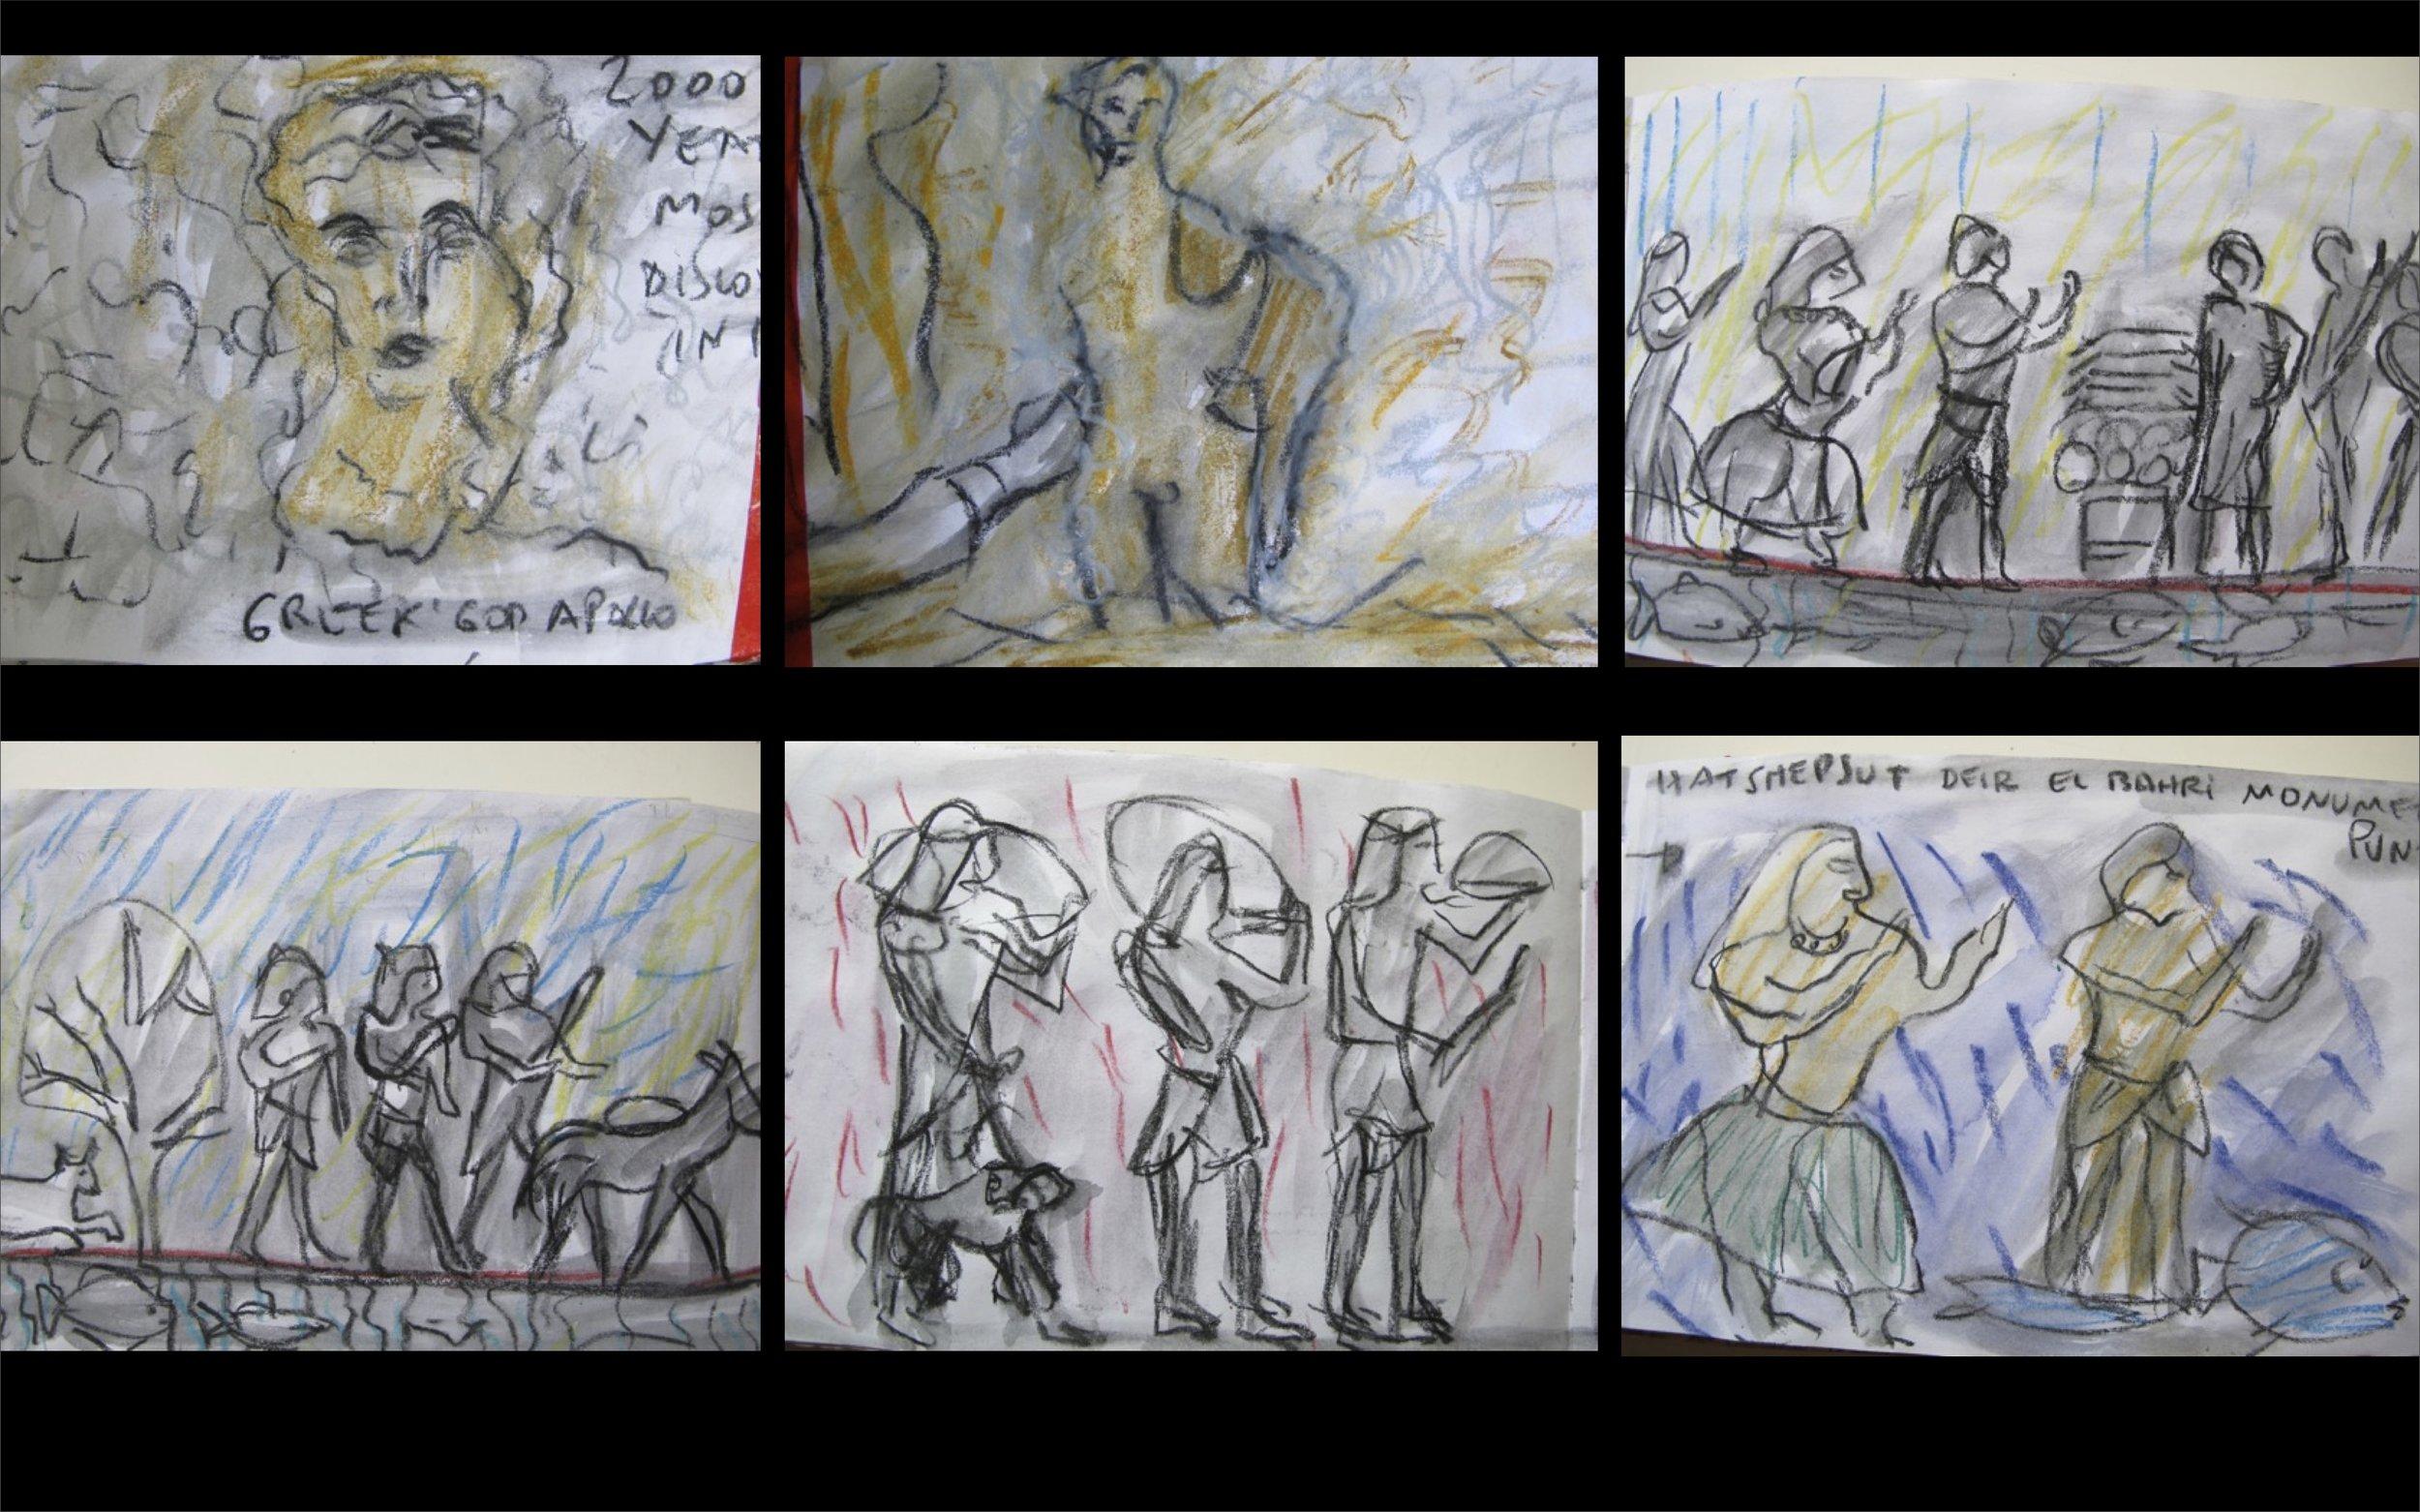 Ioana-Georgescu-SketchbookContact62011.jpg